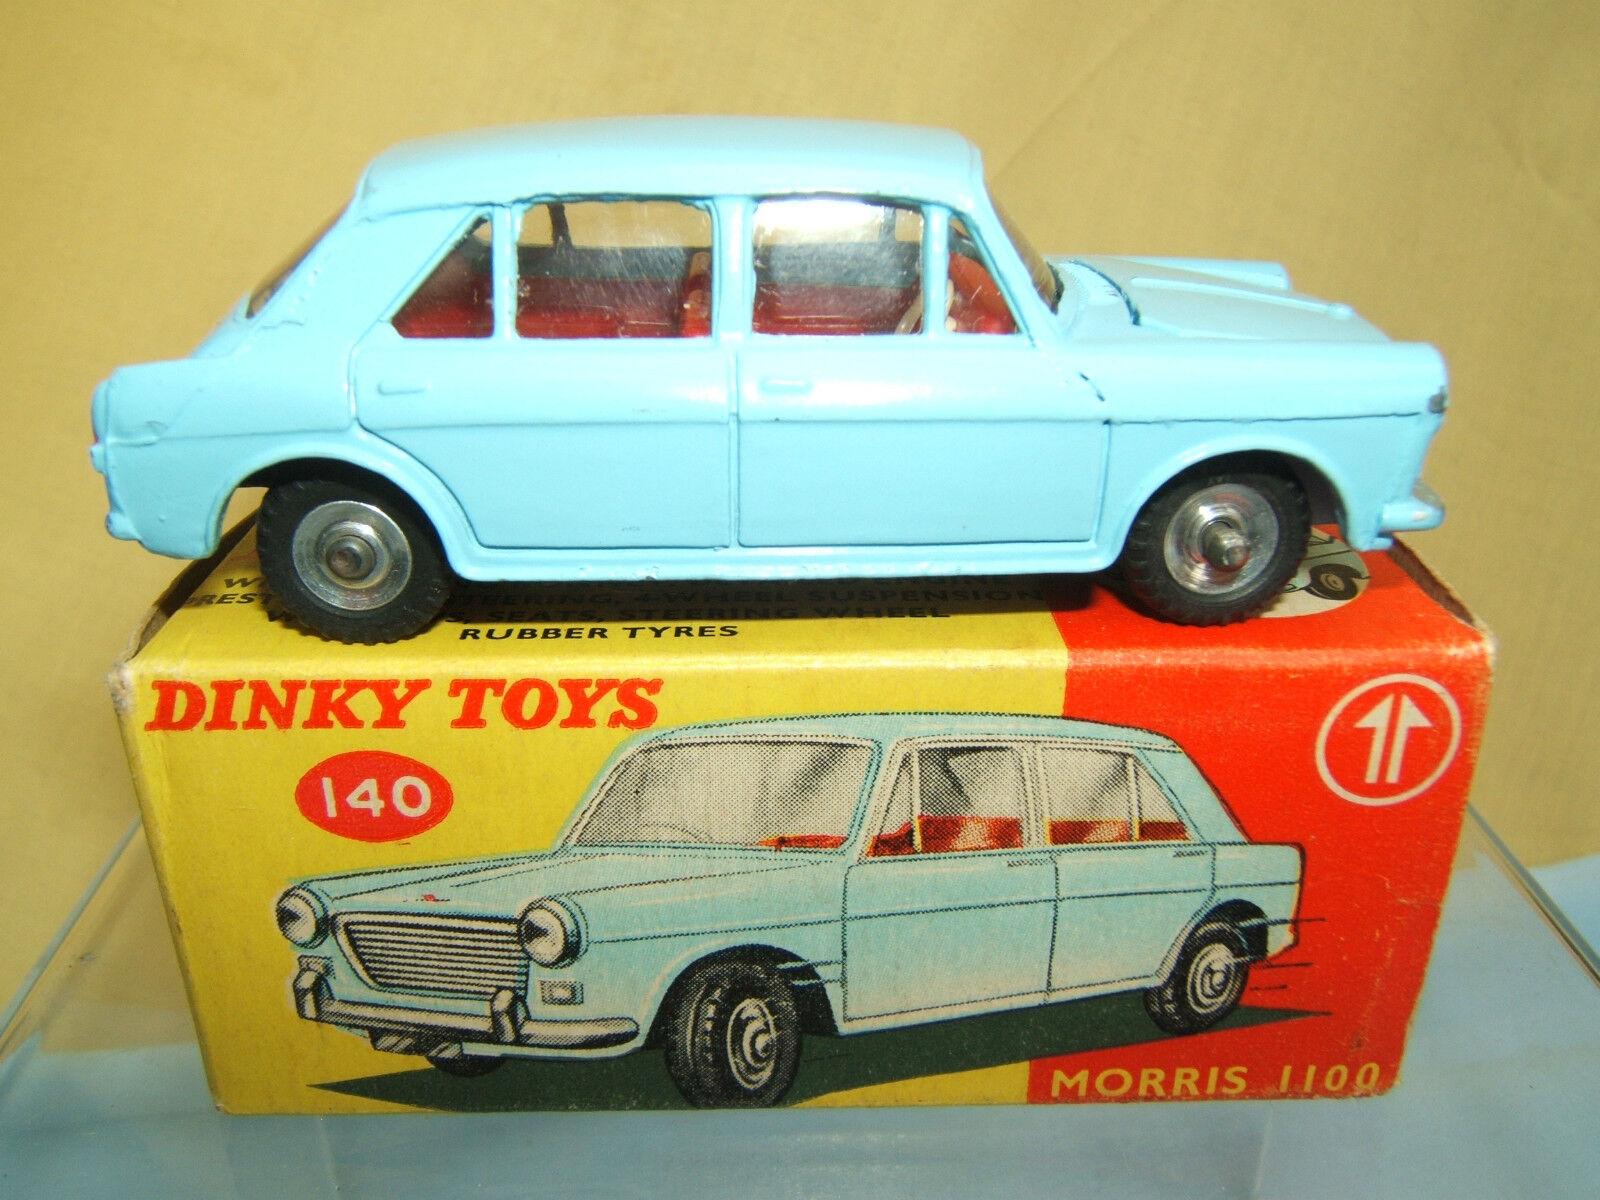 VINTAGE DINKY giocattoli modello N.140 MORRIS 1100 SALOON VN MIB